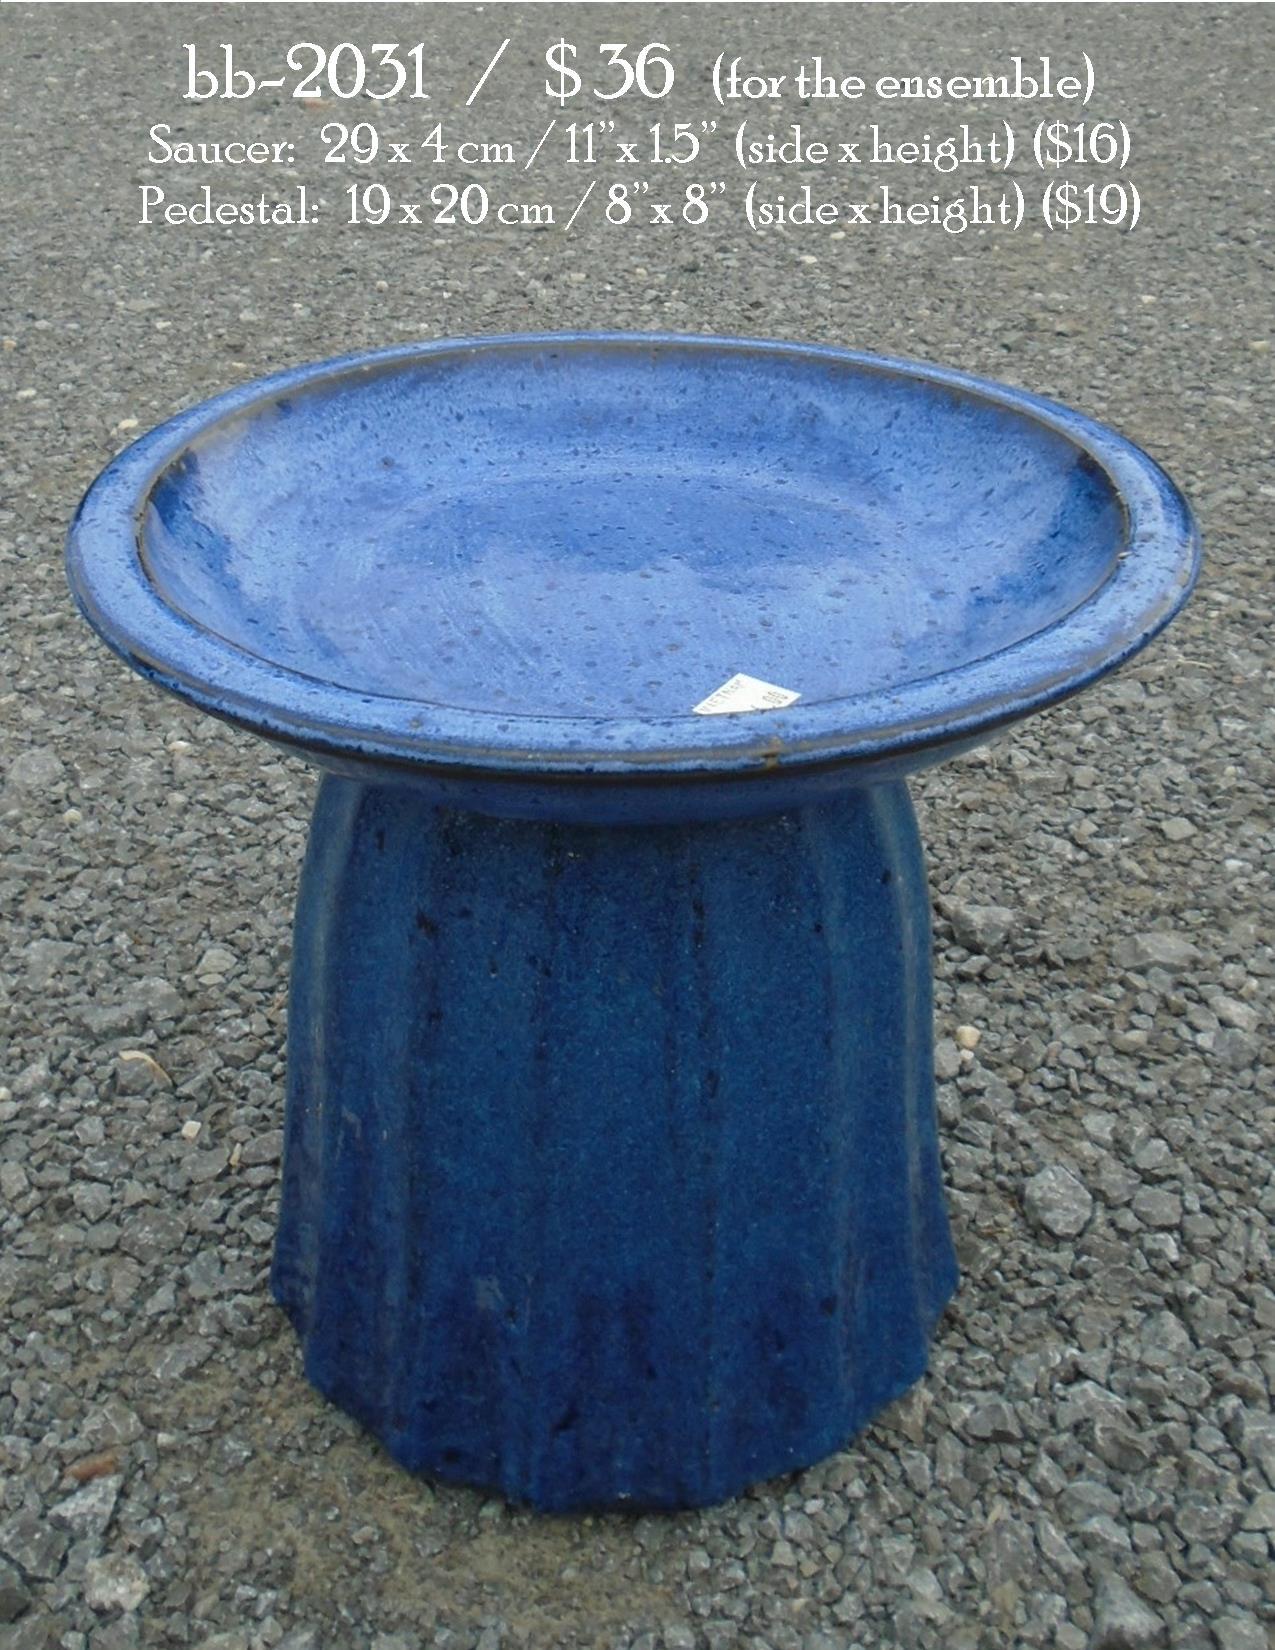 bb-2031